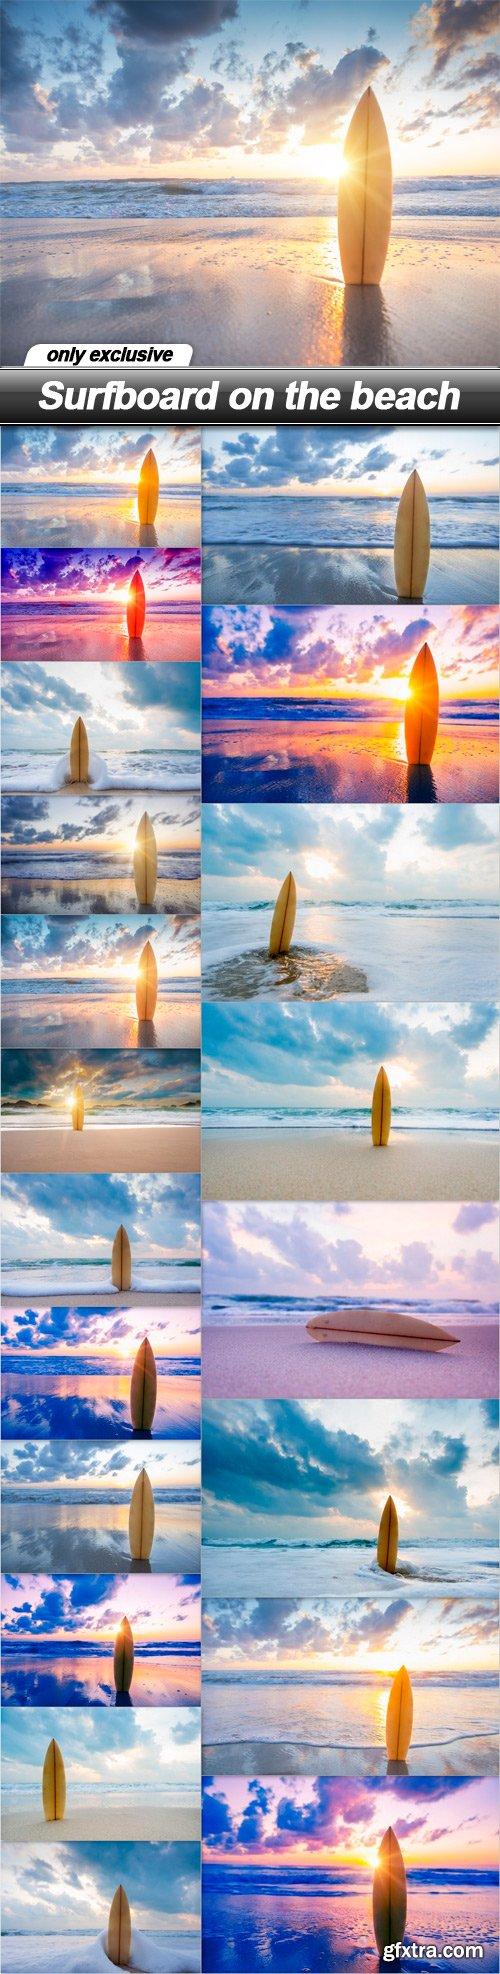 Surfboard on the beach - 20 UHQ JPEG